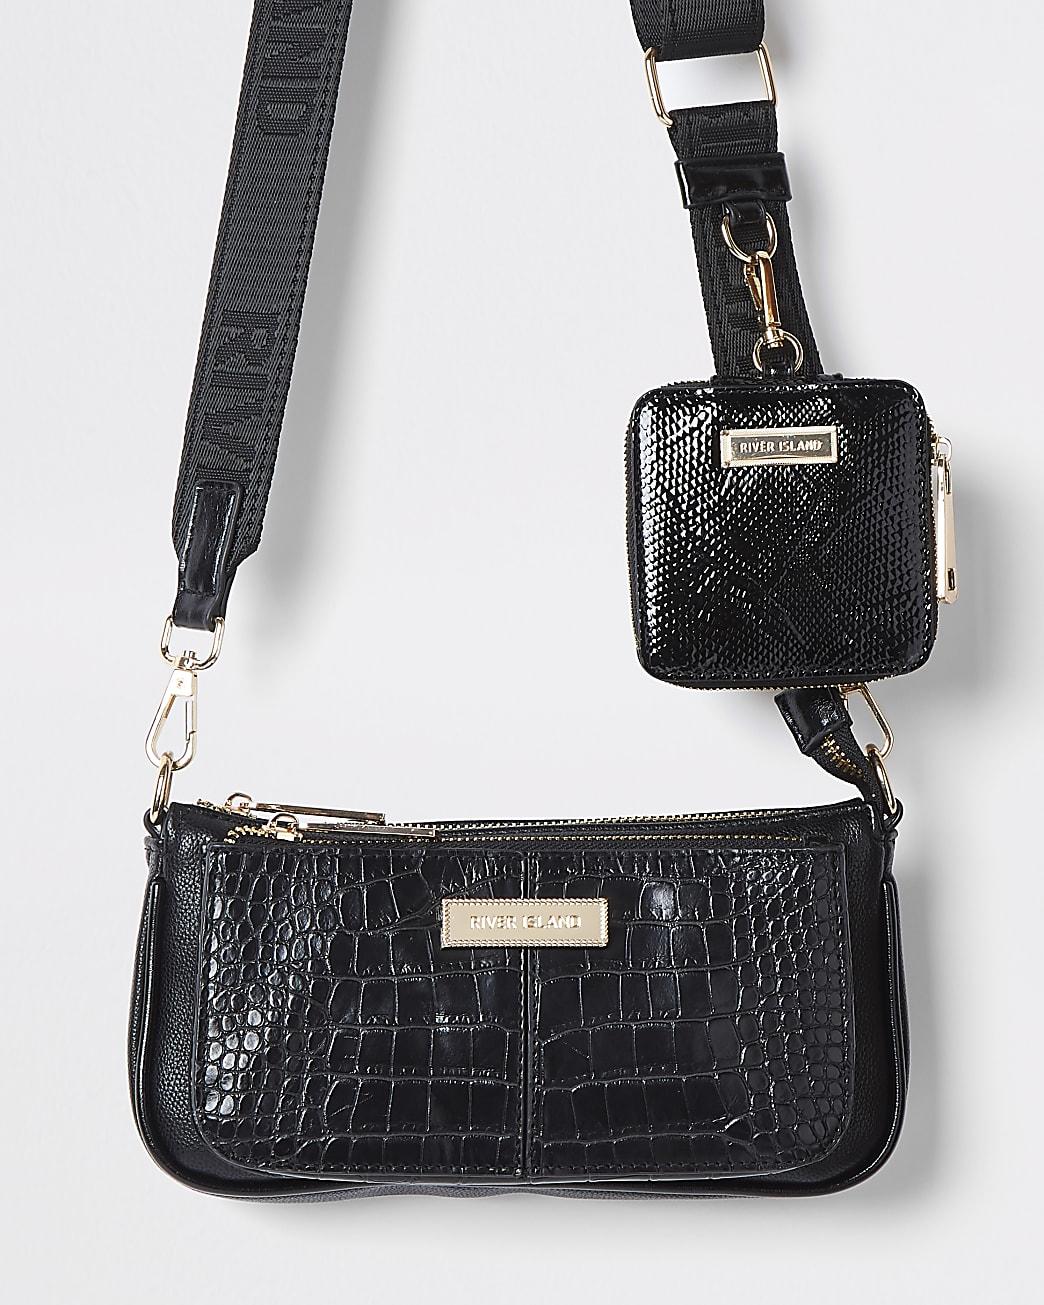 Black croc embossed cross body bag